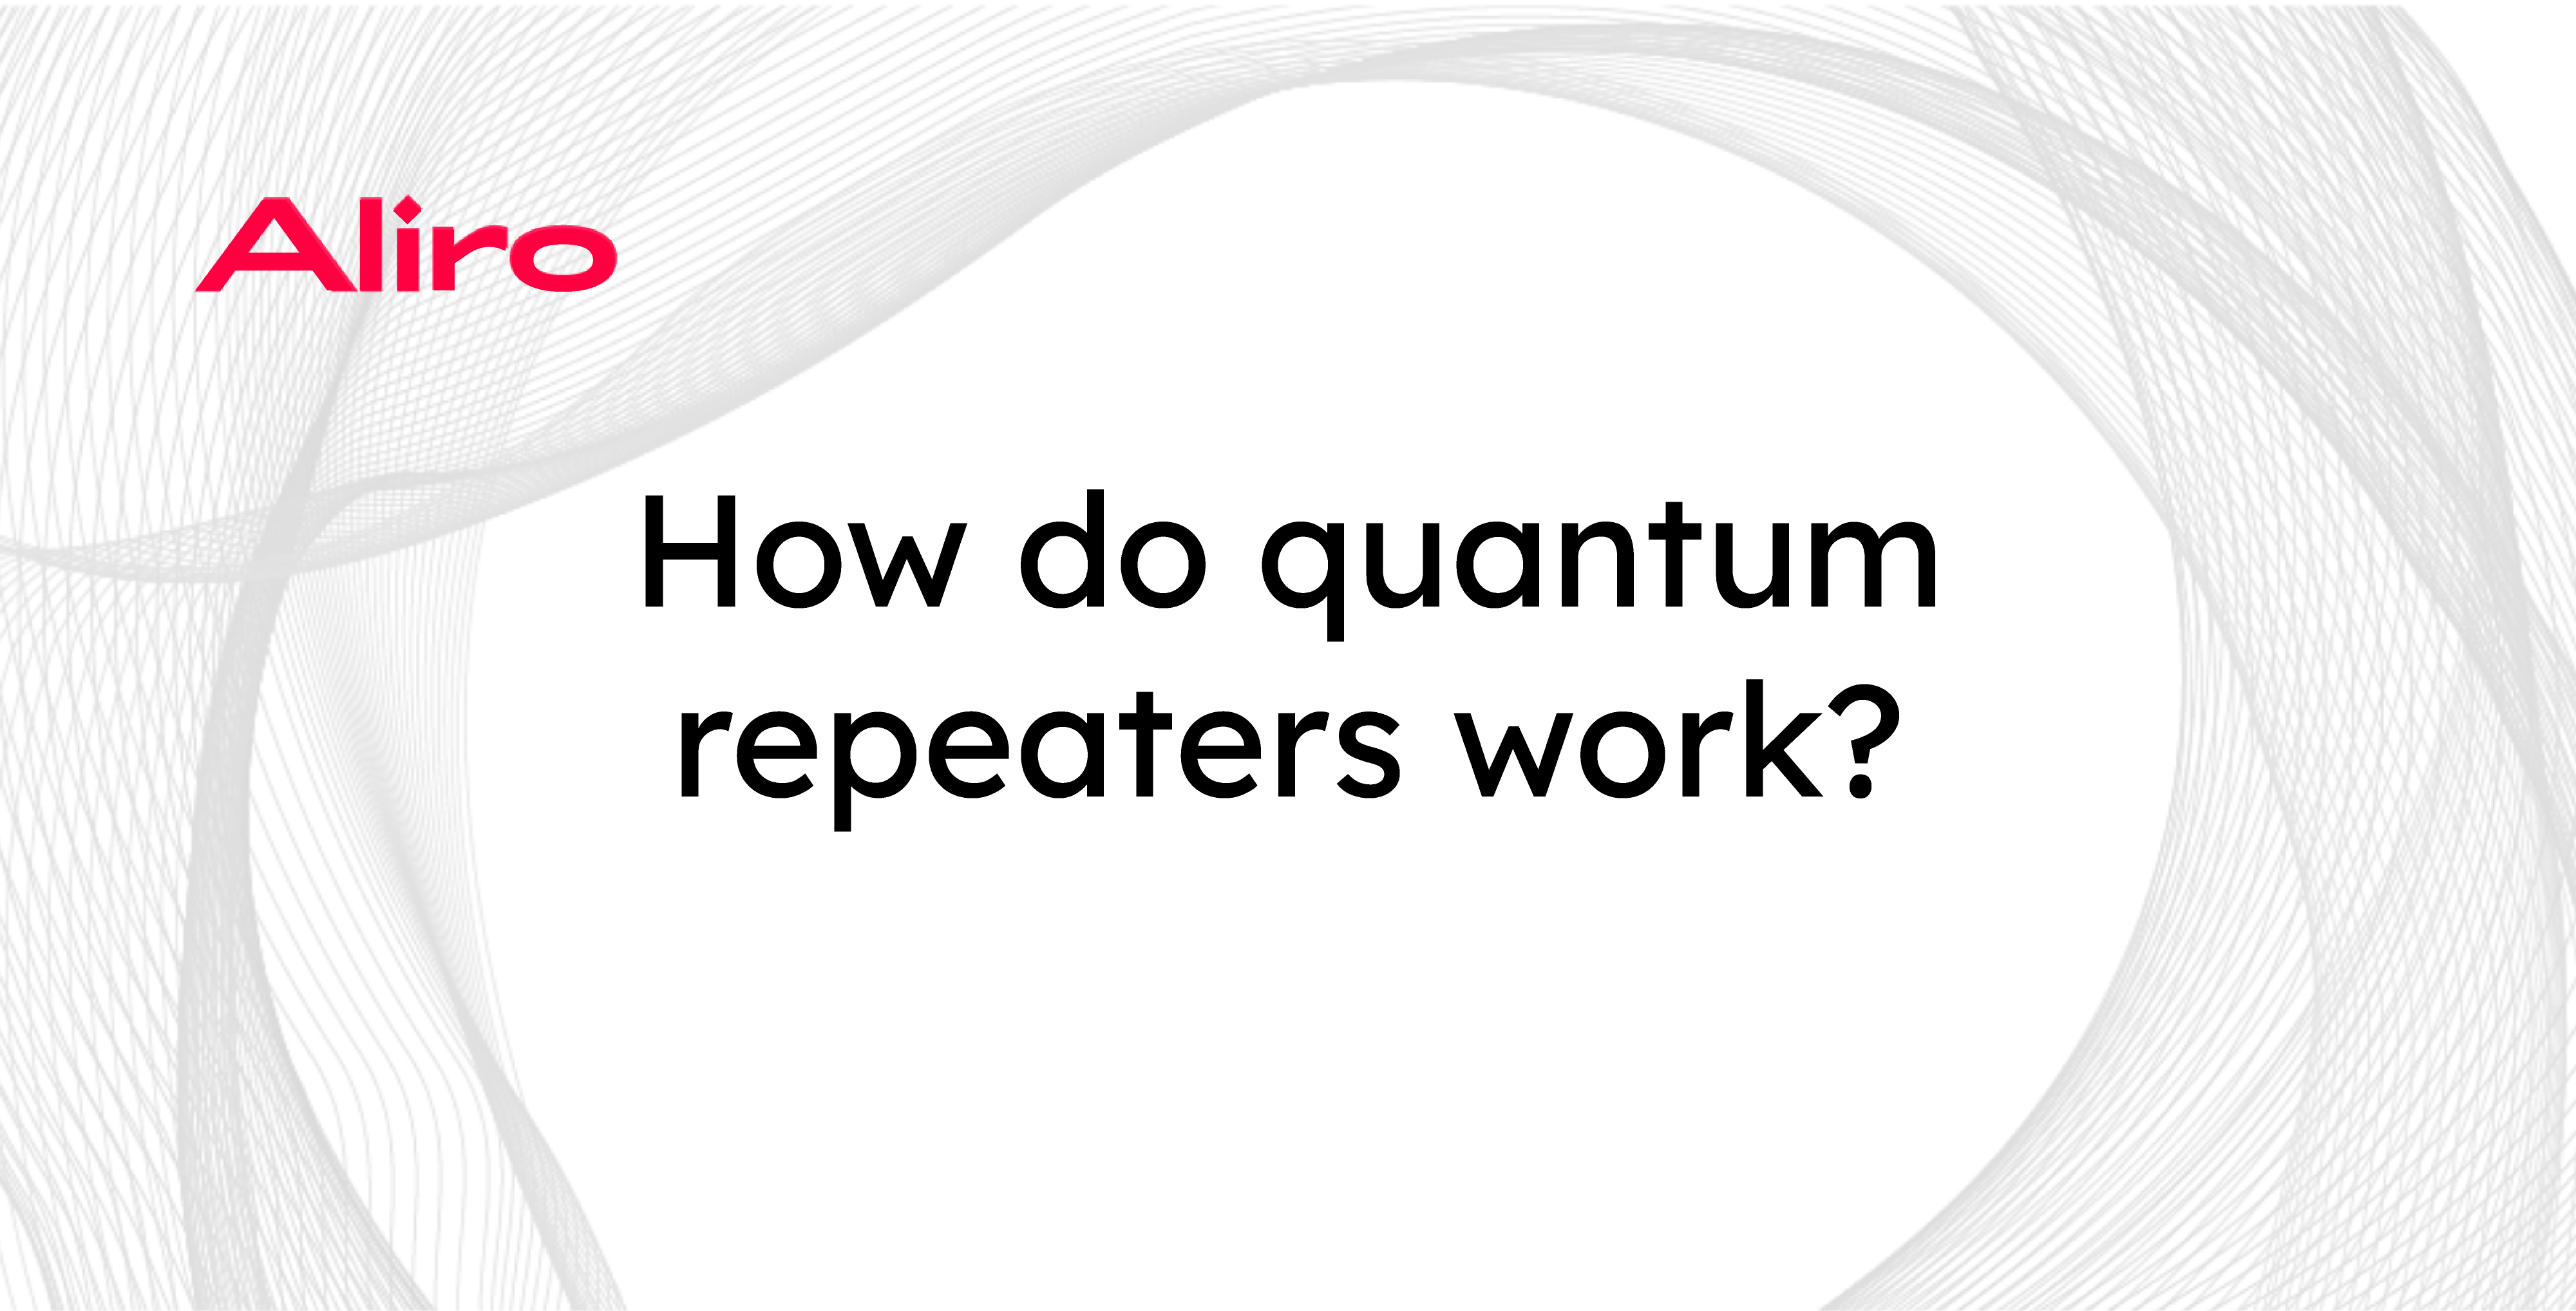 How do quantum repeaters work?